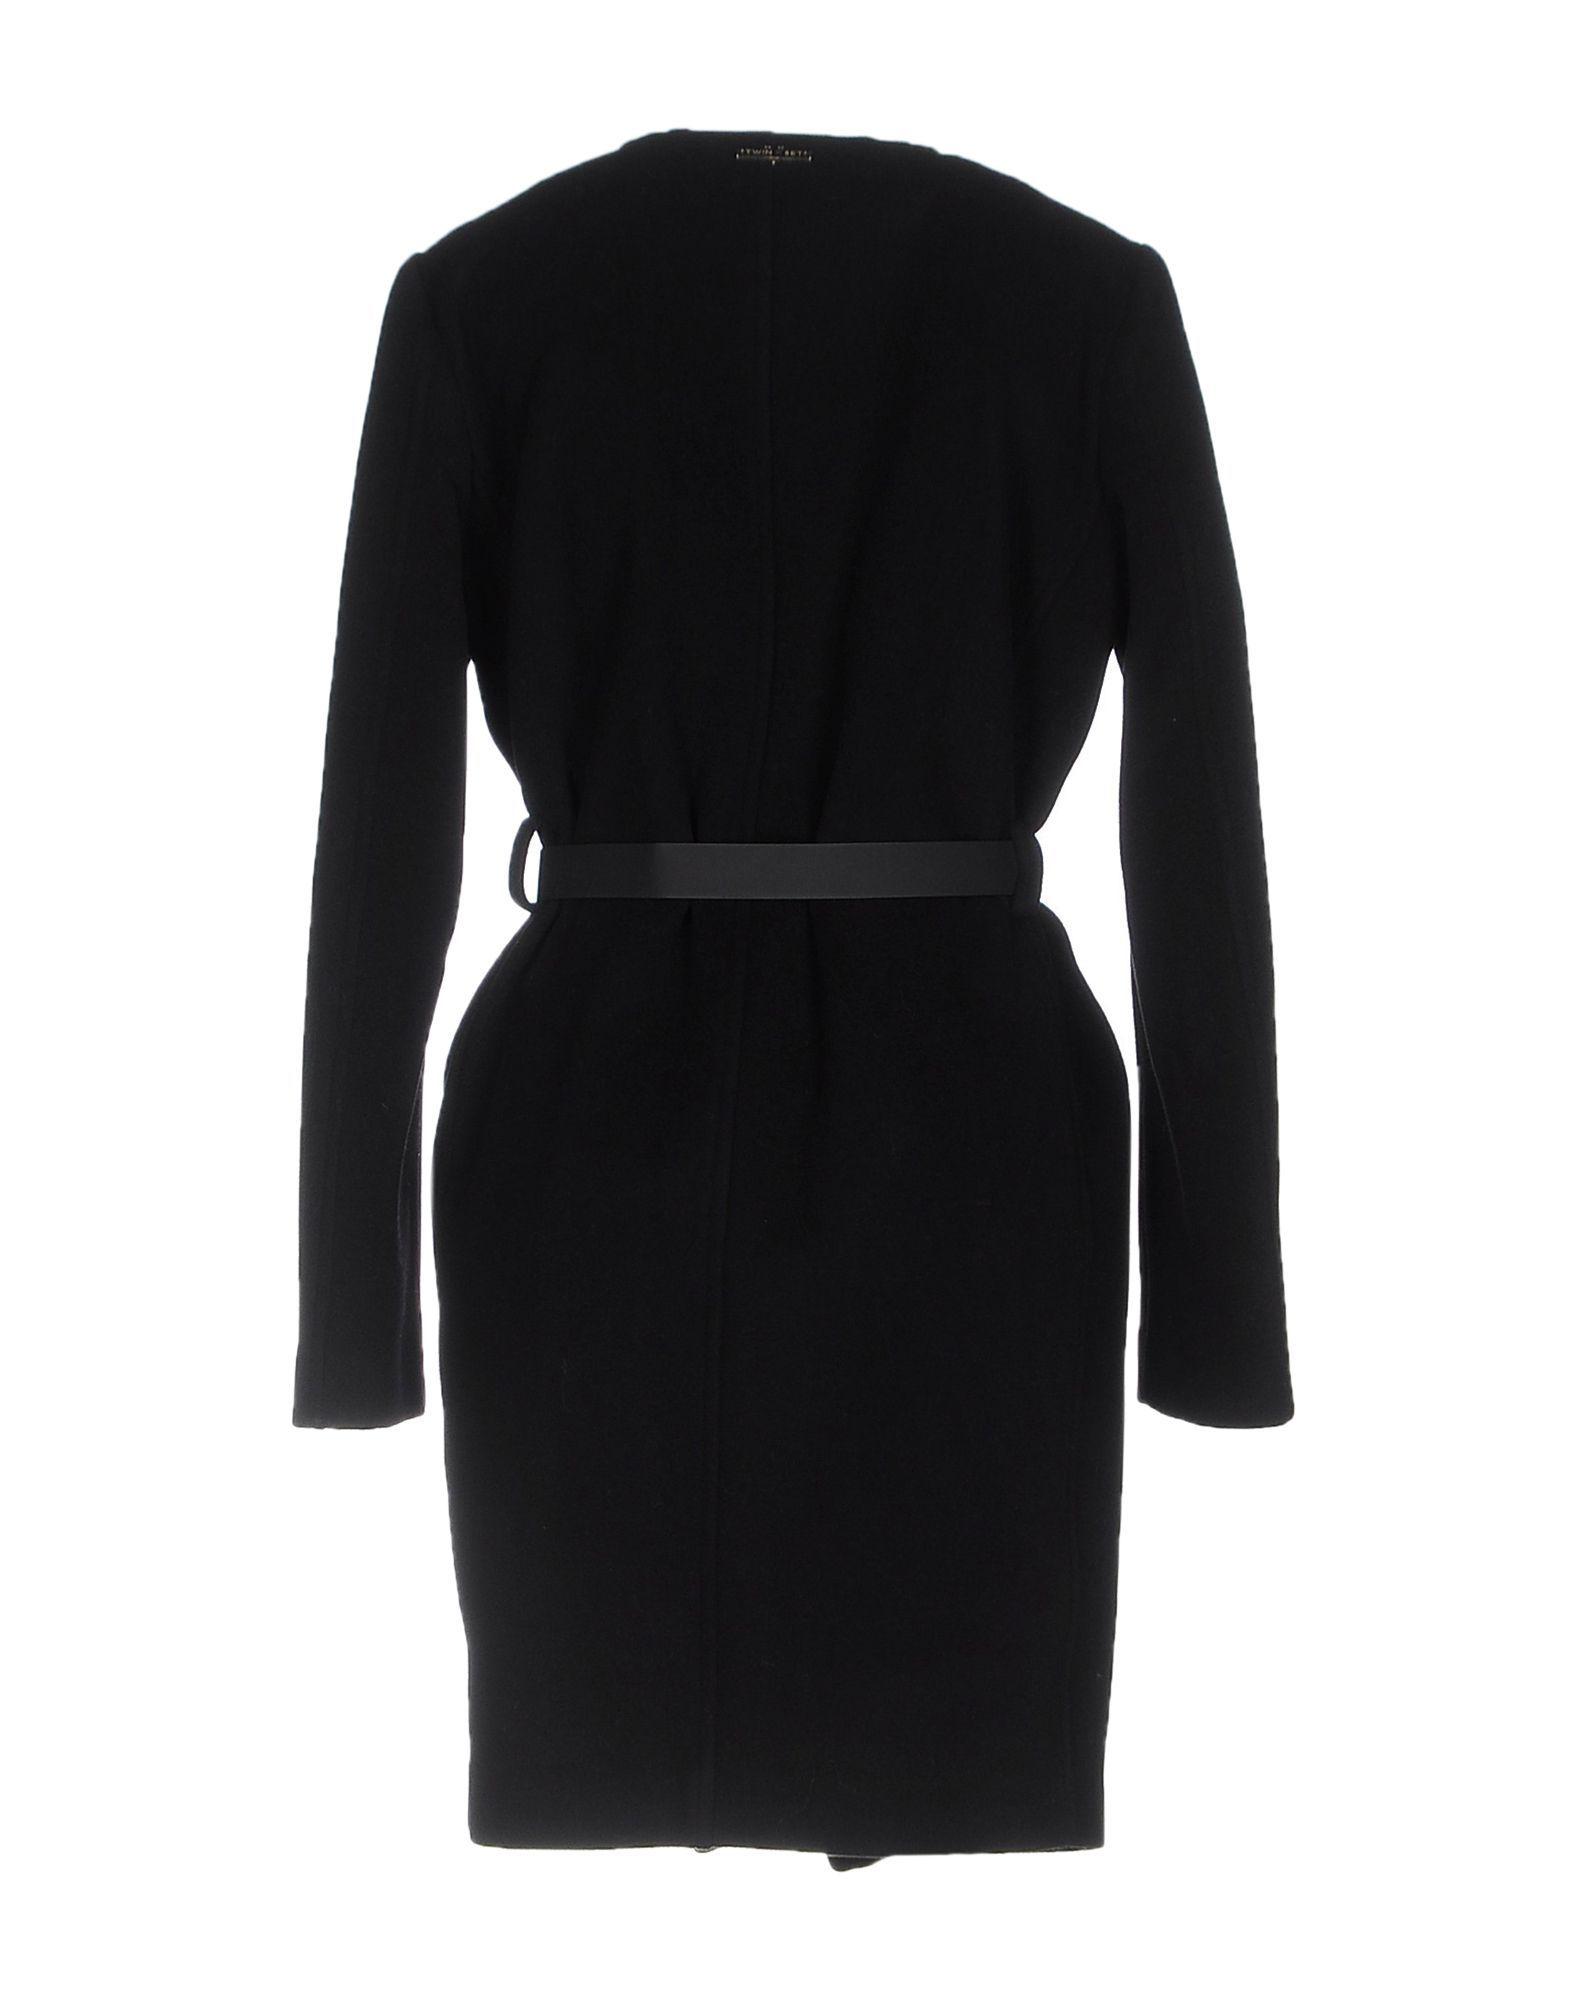 Twinset Black Virgin Wool Belted Coat